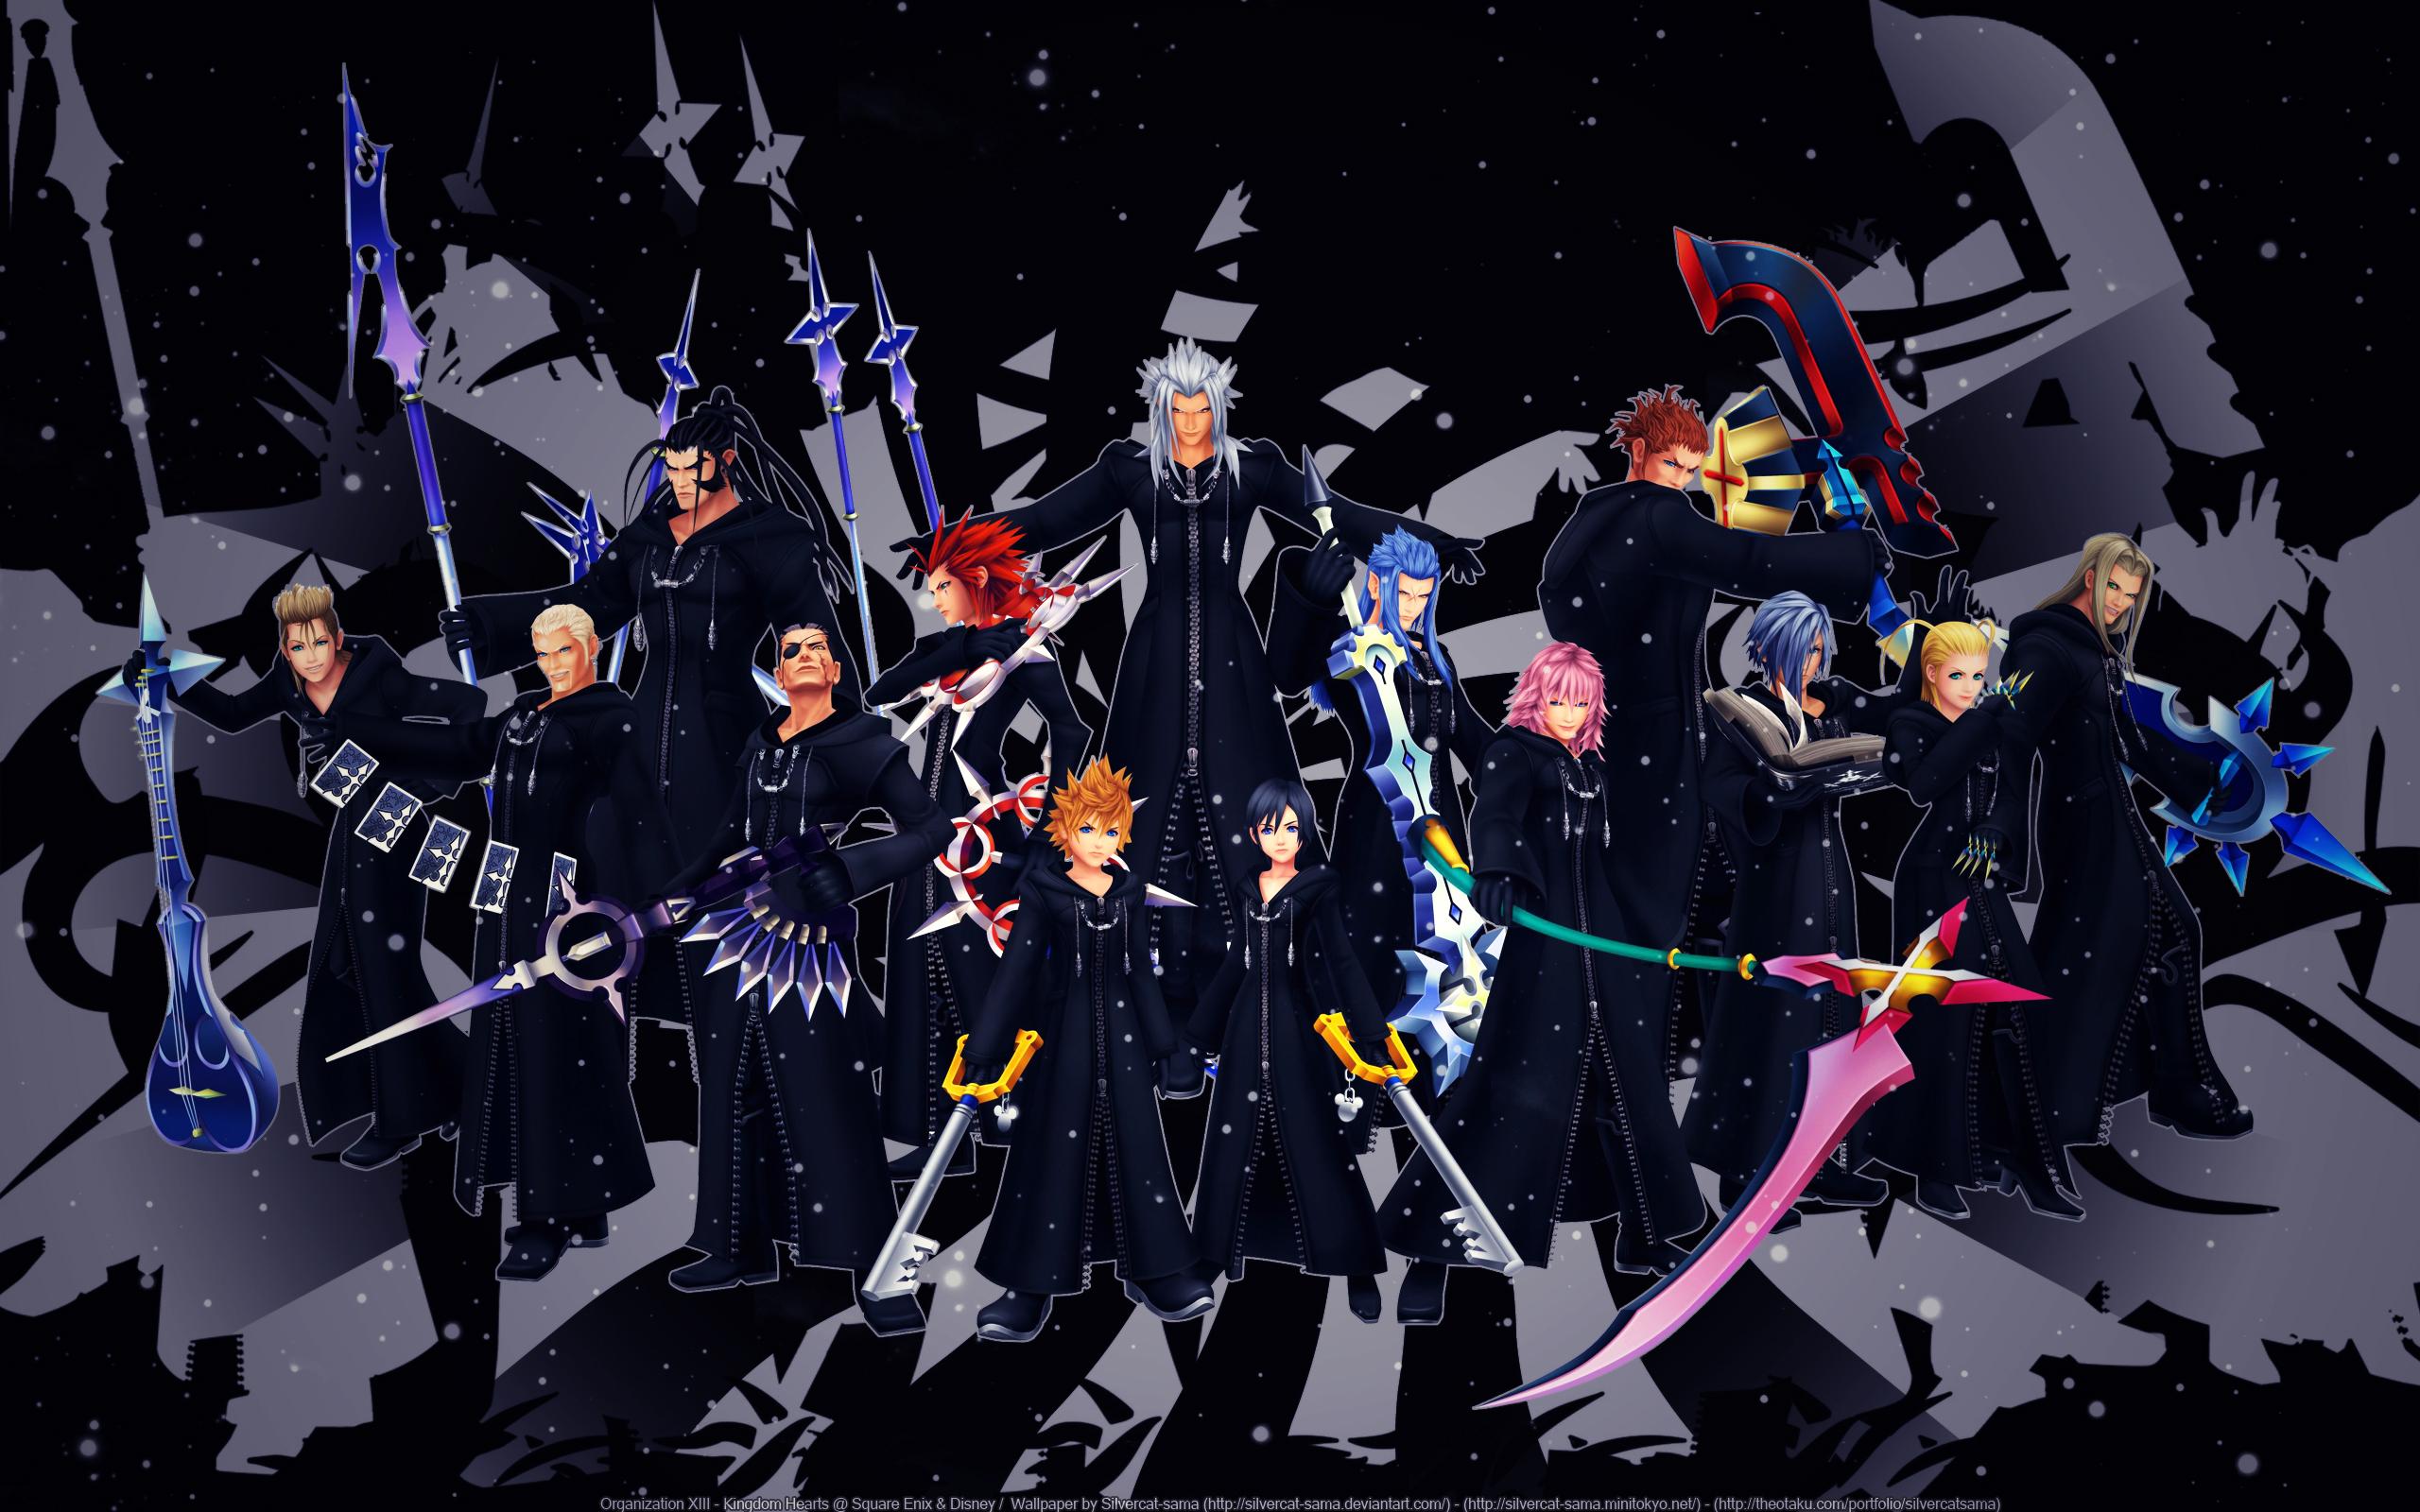 Kingdom Hearts Wallpaper: Organization XIII - Minitokyo Kingdom Hearts Organization 13 Wallpaper